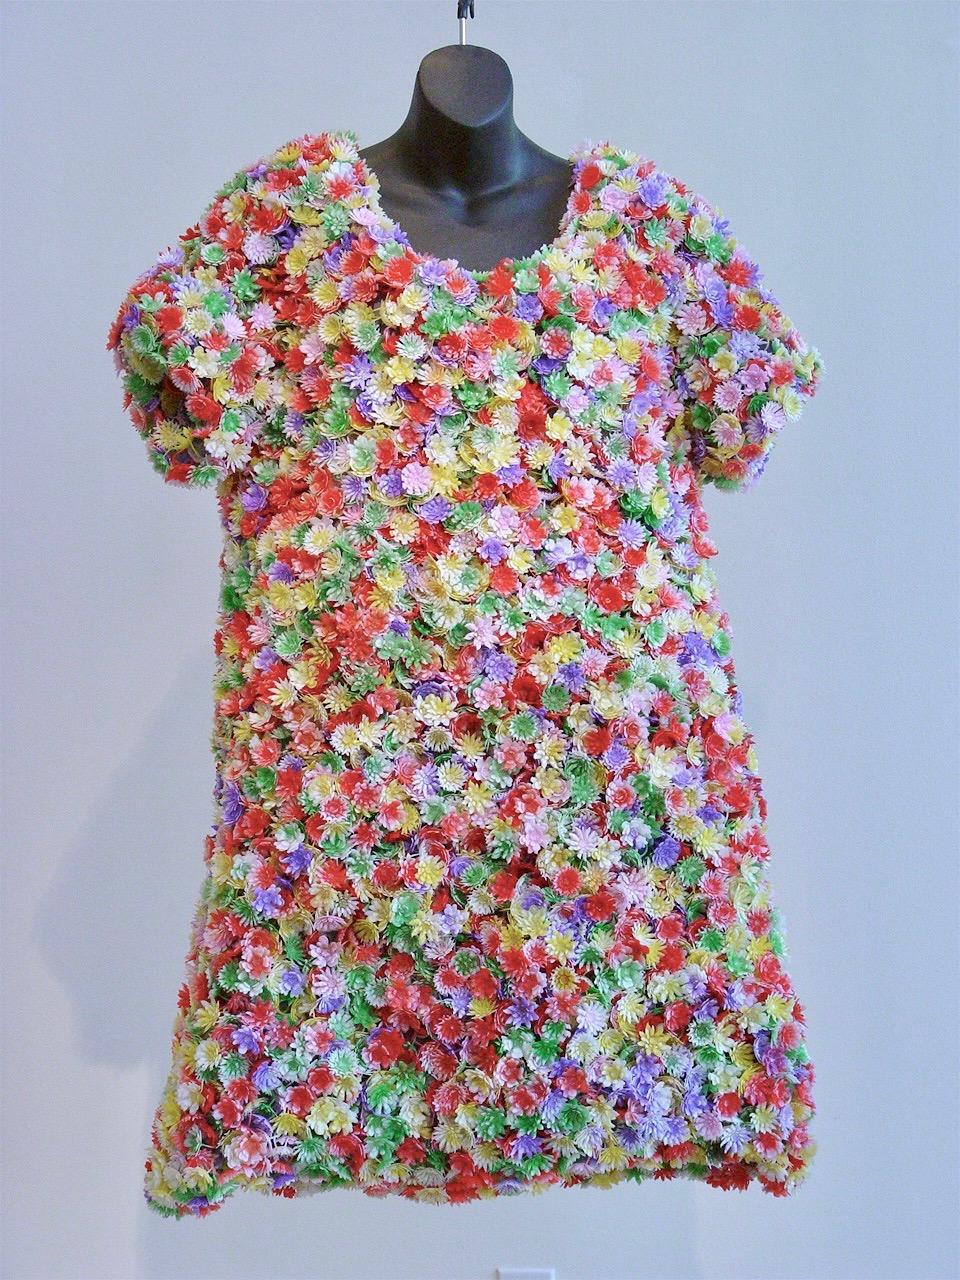 Garment for a Well Behaved Woman.  Plastic flower rings, thread, linen dress.